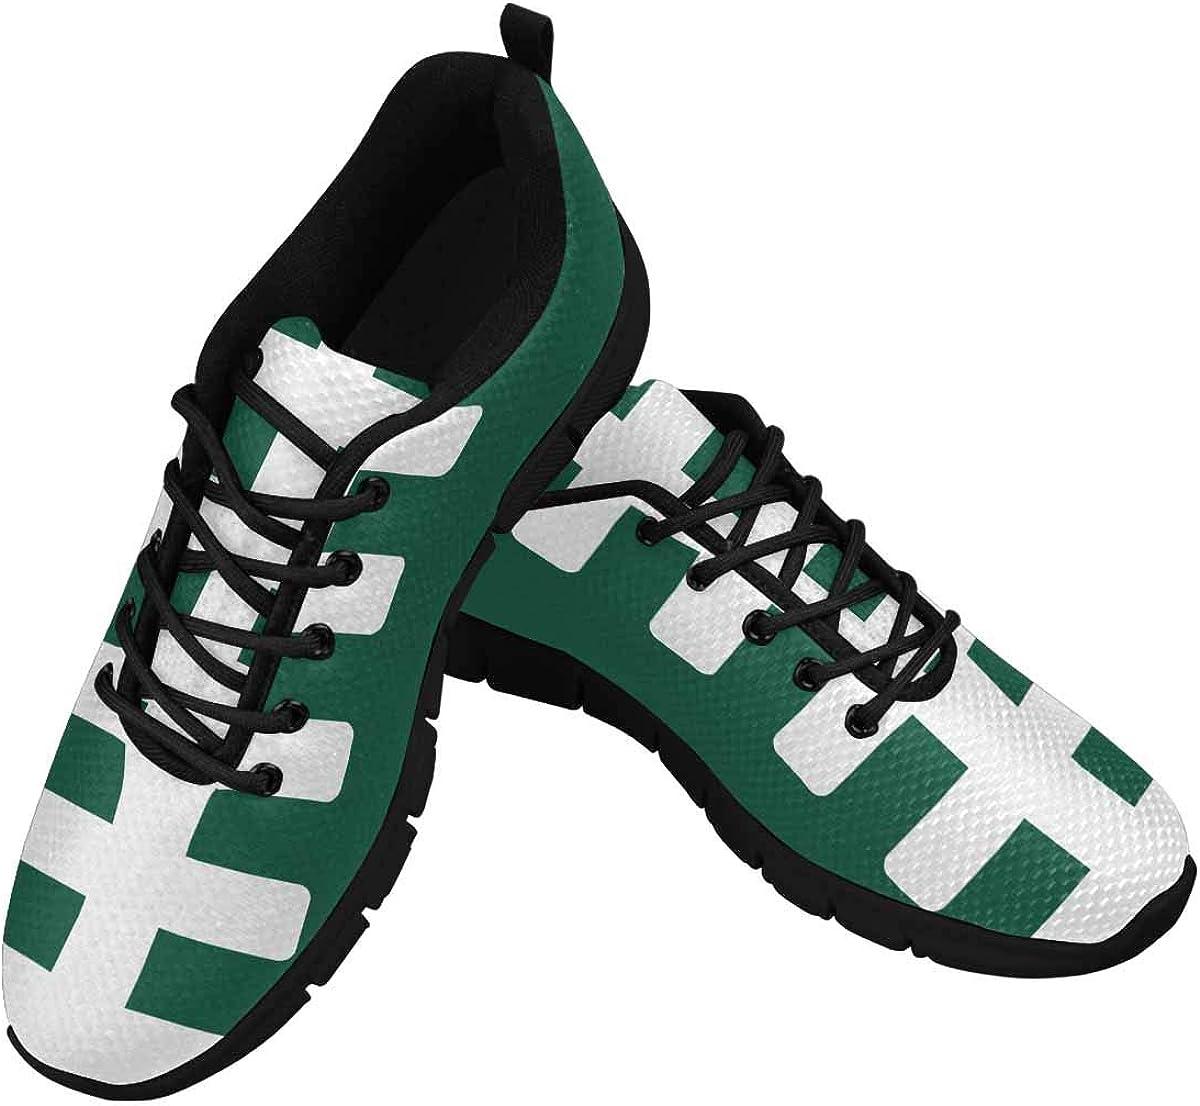 INTERESTPRINT American Football Field Sports Green Women's Breathable Non Slip Sneakers